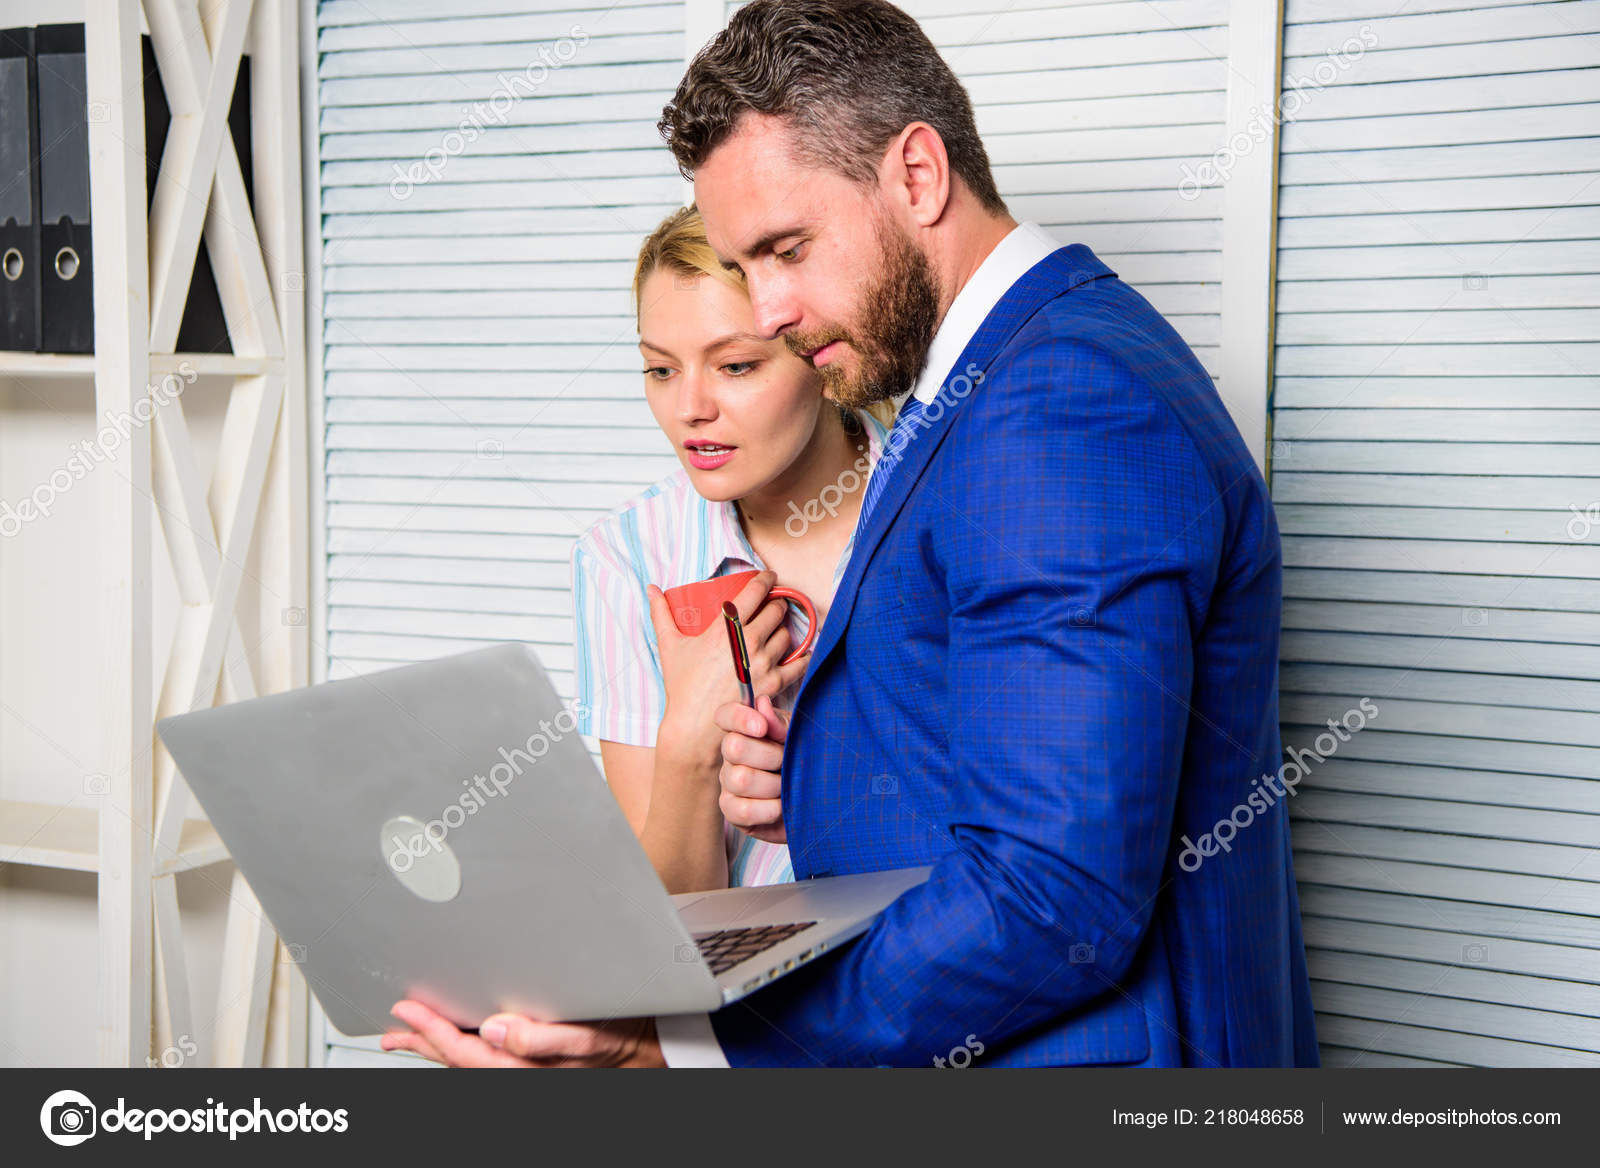 velocità di appuntamenti segreti